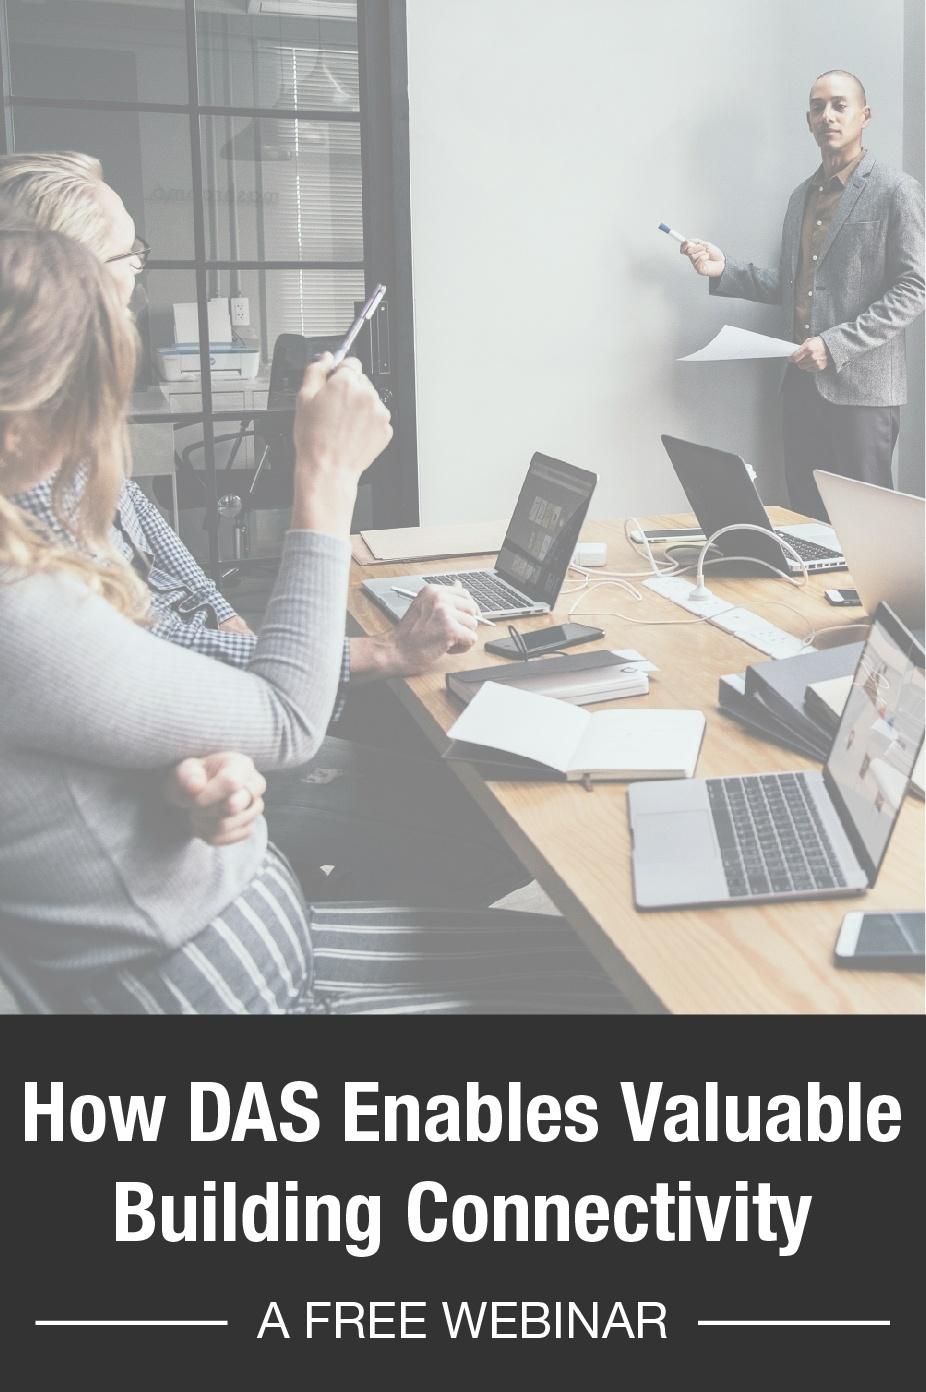 How DAS Enables Valuable Building Connectivity_Sidebar Vert 222x334